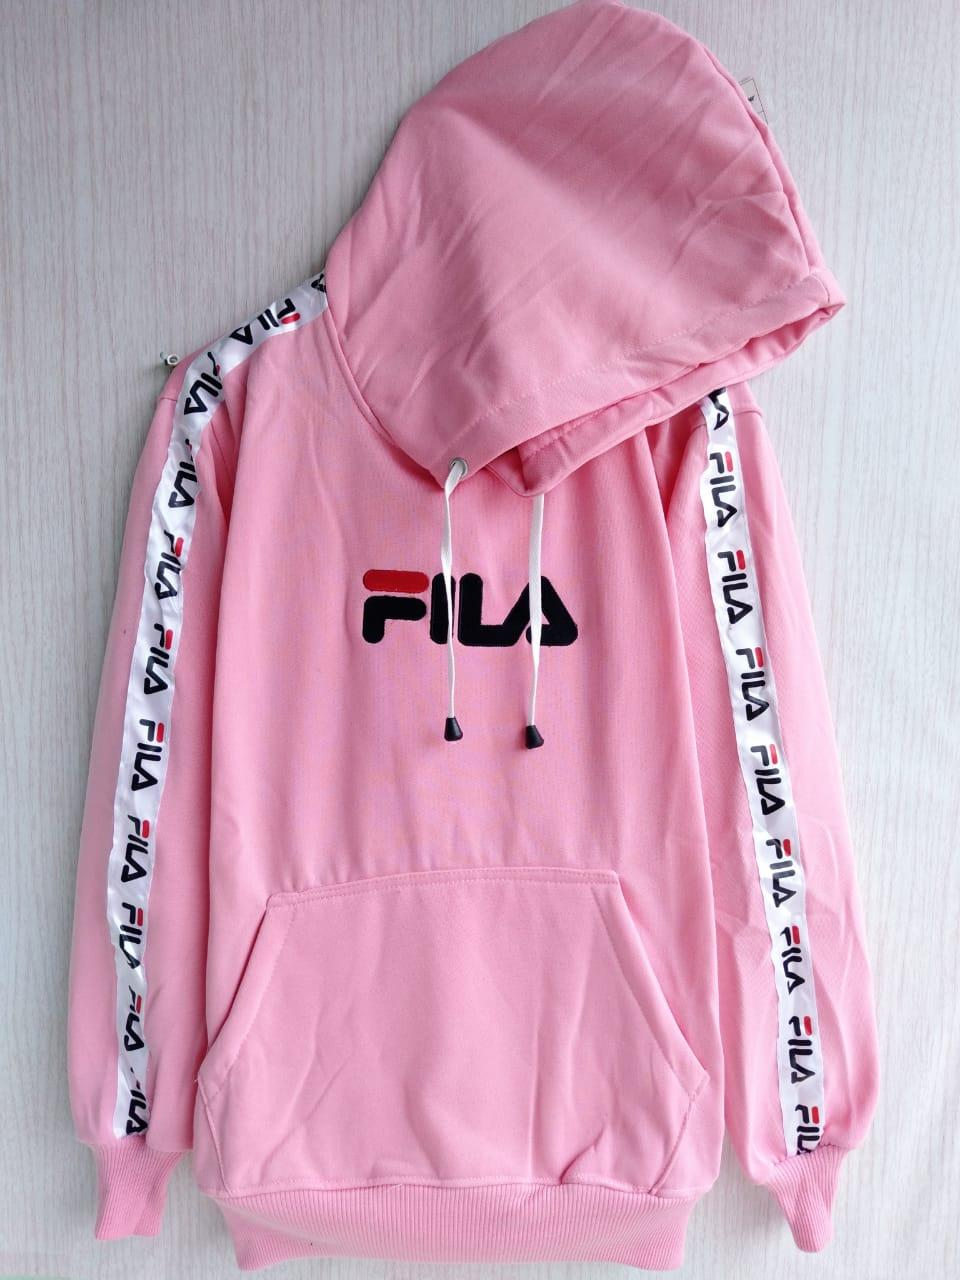 21745da28 Review New Jaket Sweater Fila Footwear Usa Fashion Pria Wanita Navy ...